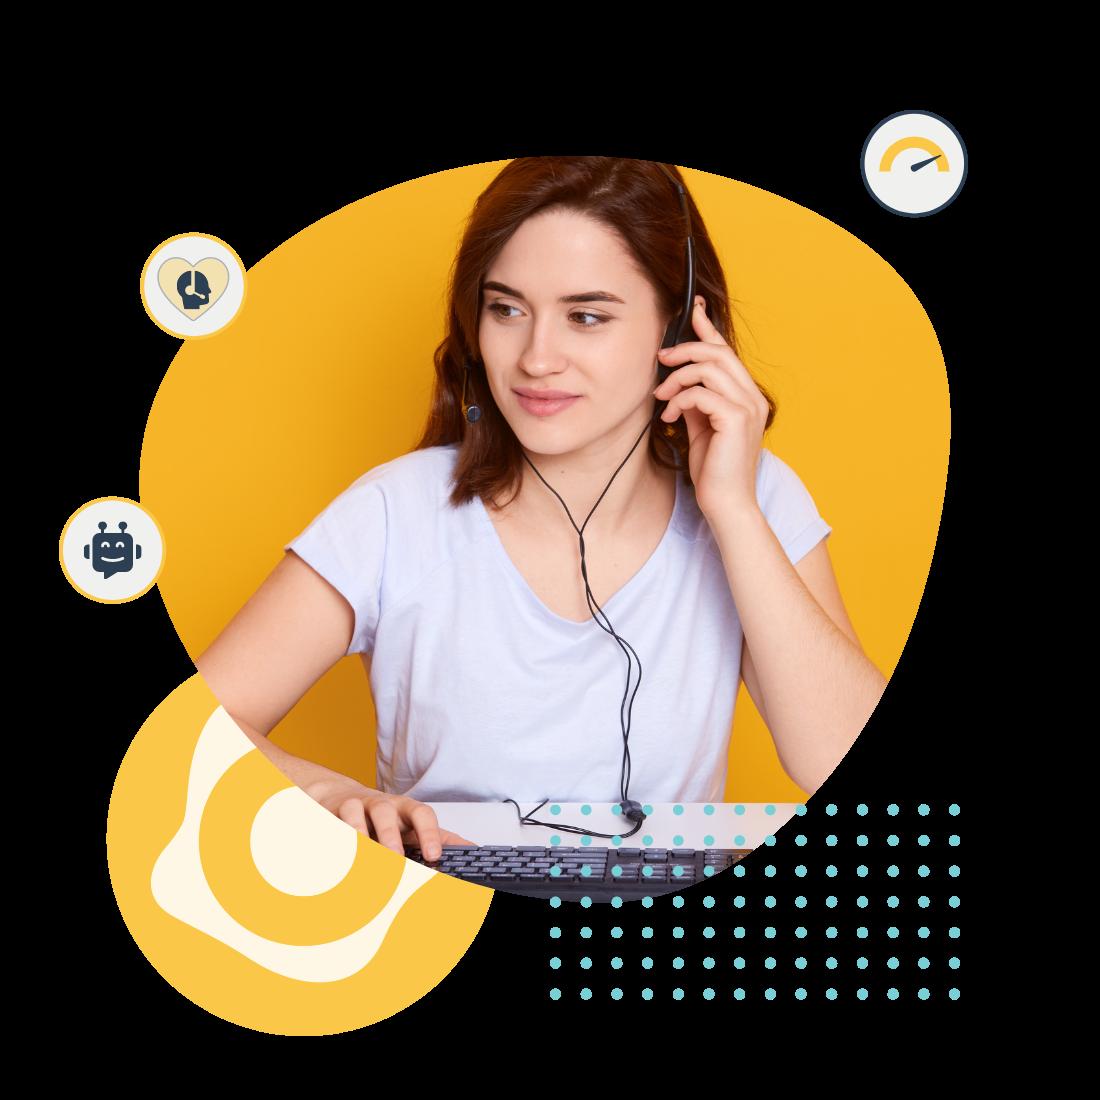 Improving Telecoms Customer Service Quality